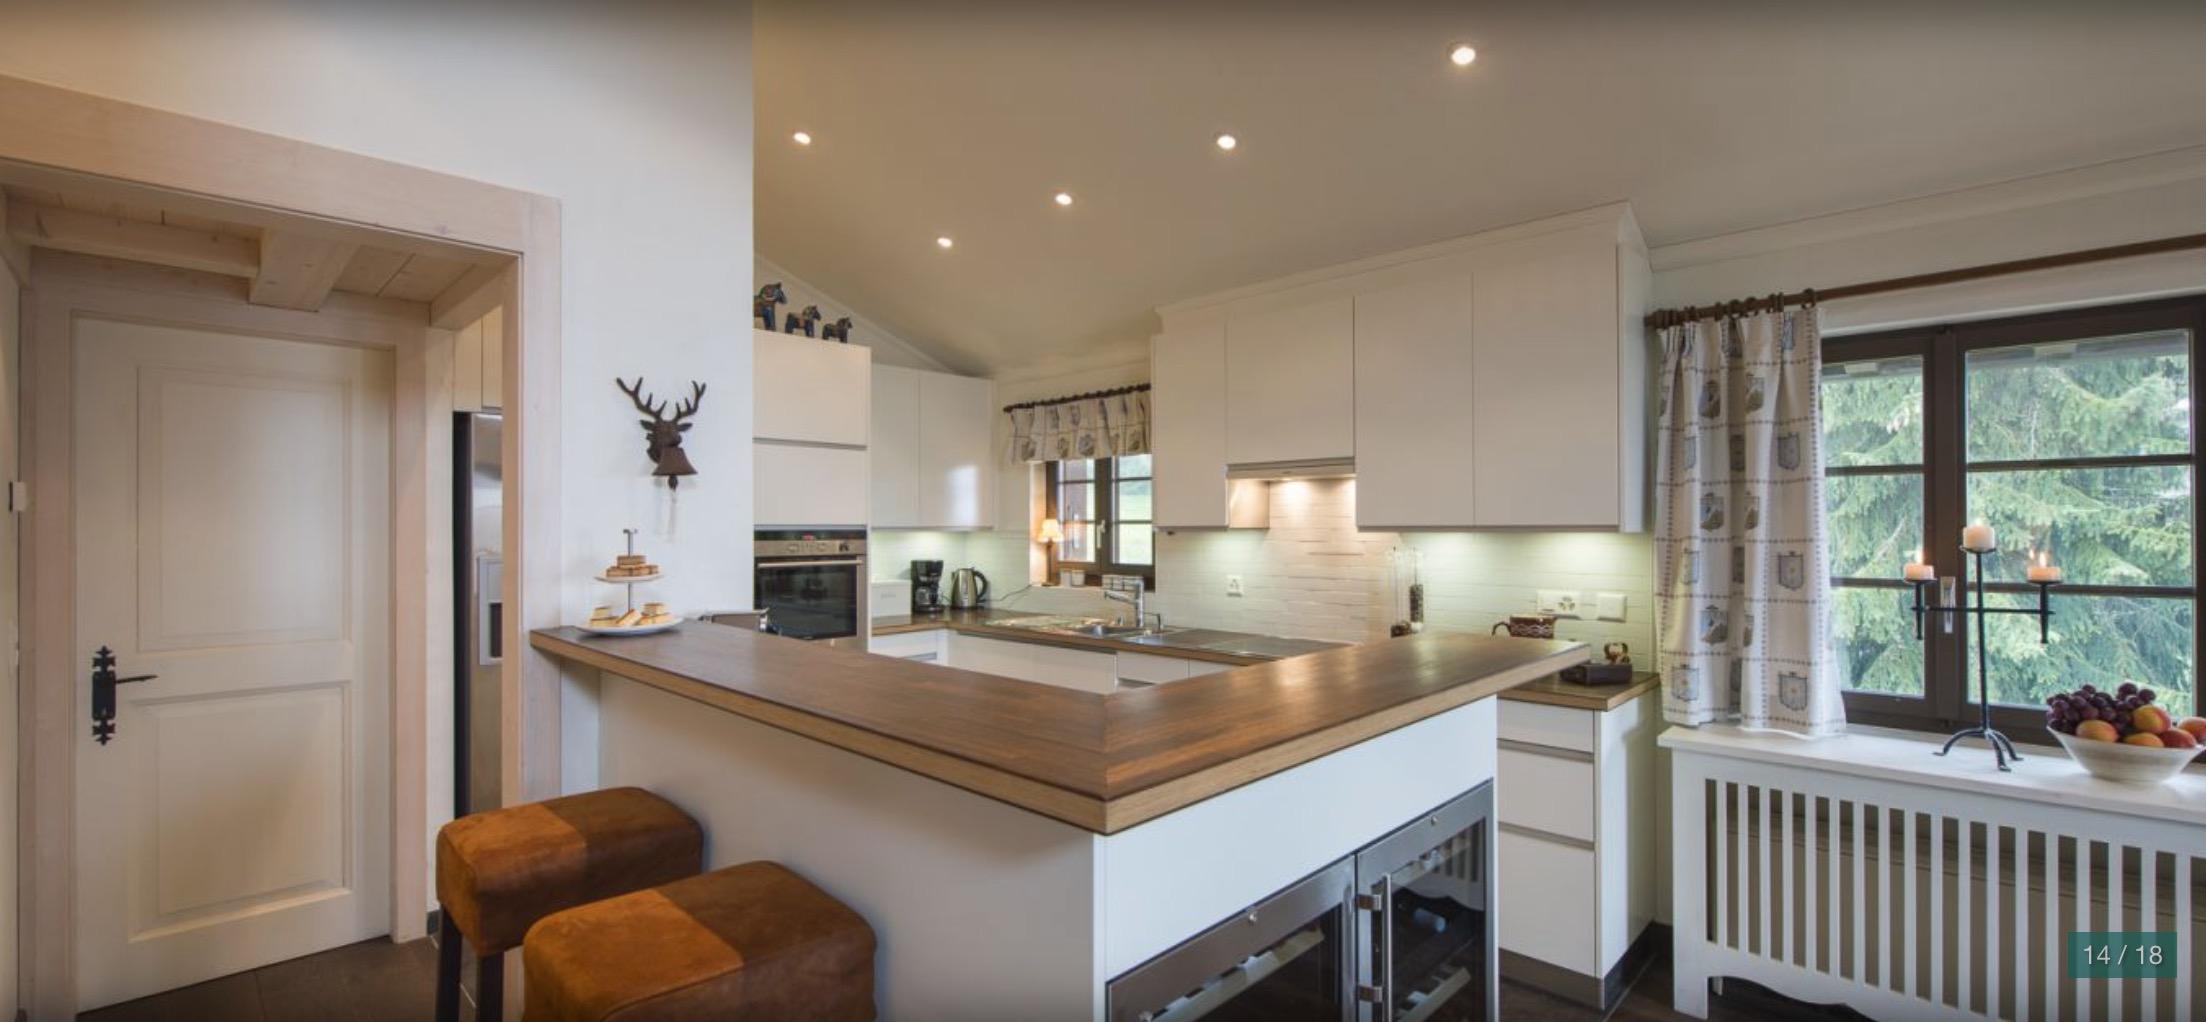 Fayard kitchen verbier chalet apartments for rent